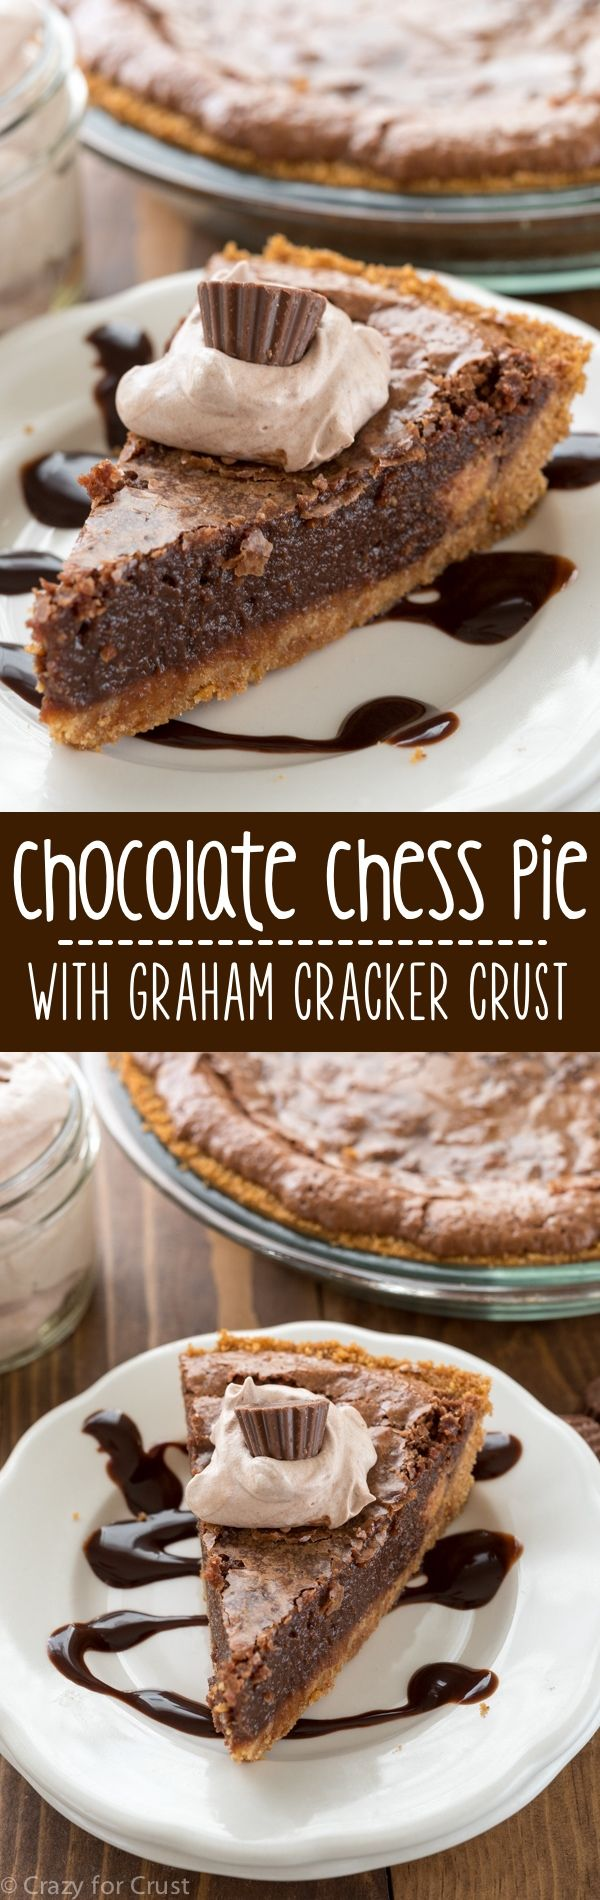 Best 25+ Chocolate pie filling ideas on Pinterest | Chocolate pie ...